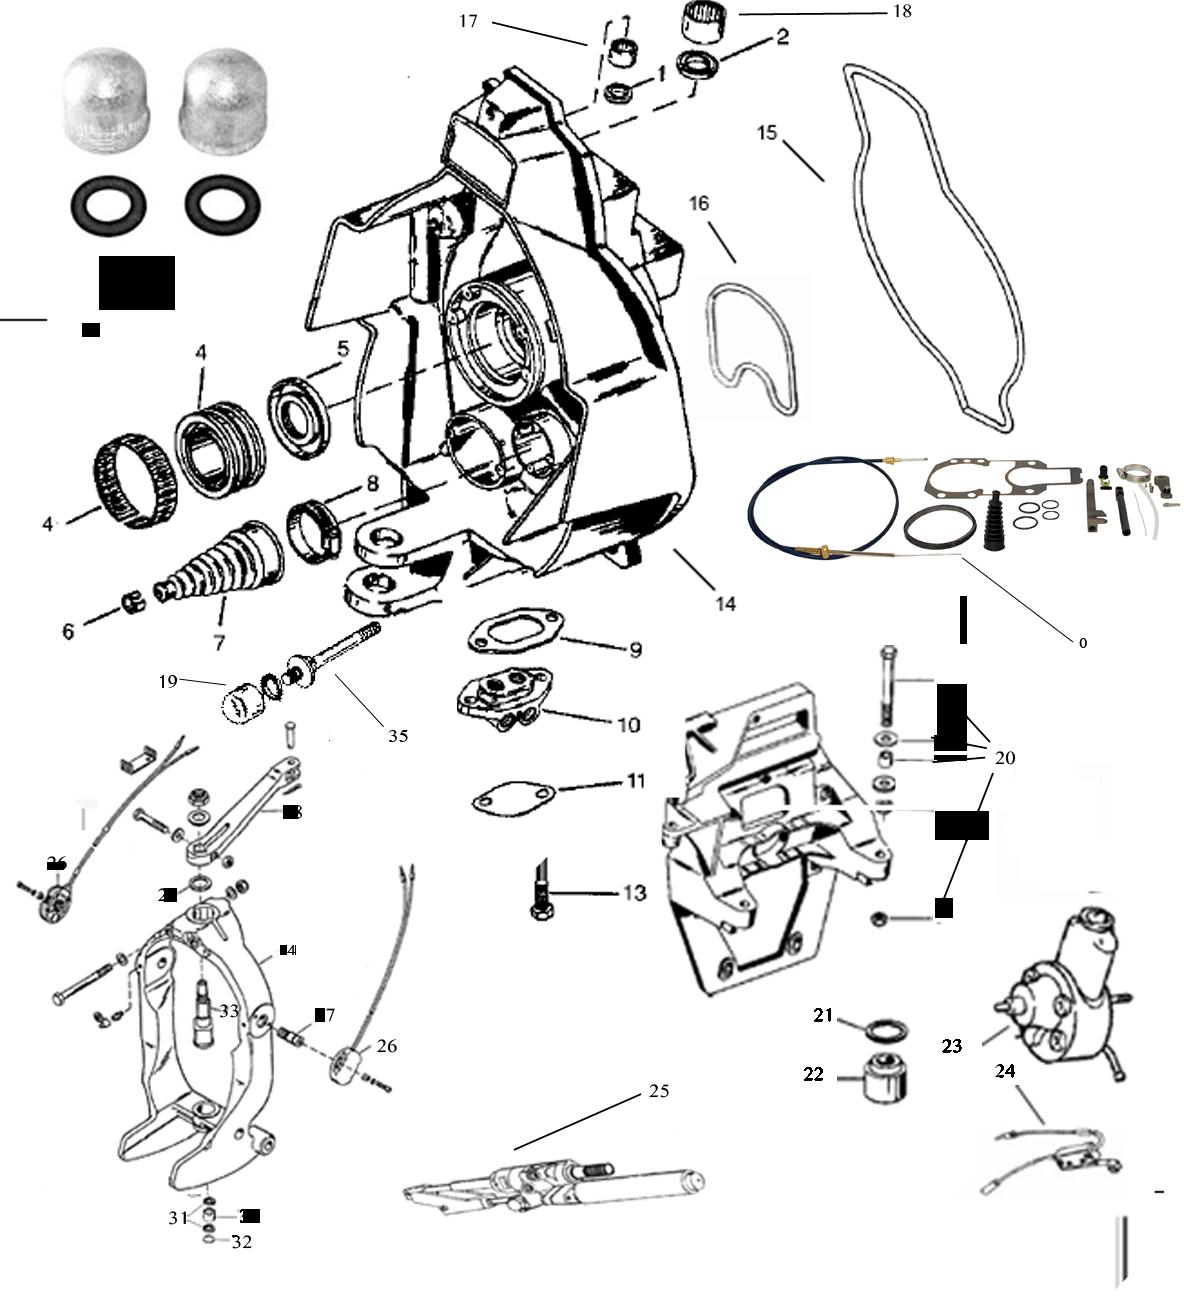 MerCruiser Alpha One Gen. 1 (1975-1990) skölddelar lista 2